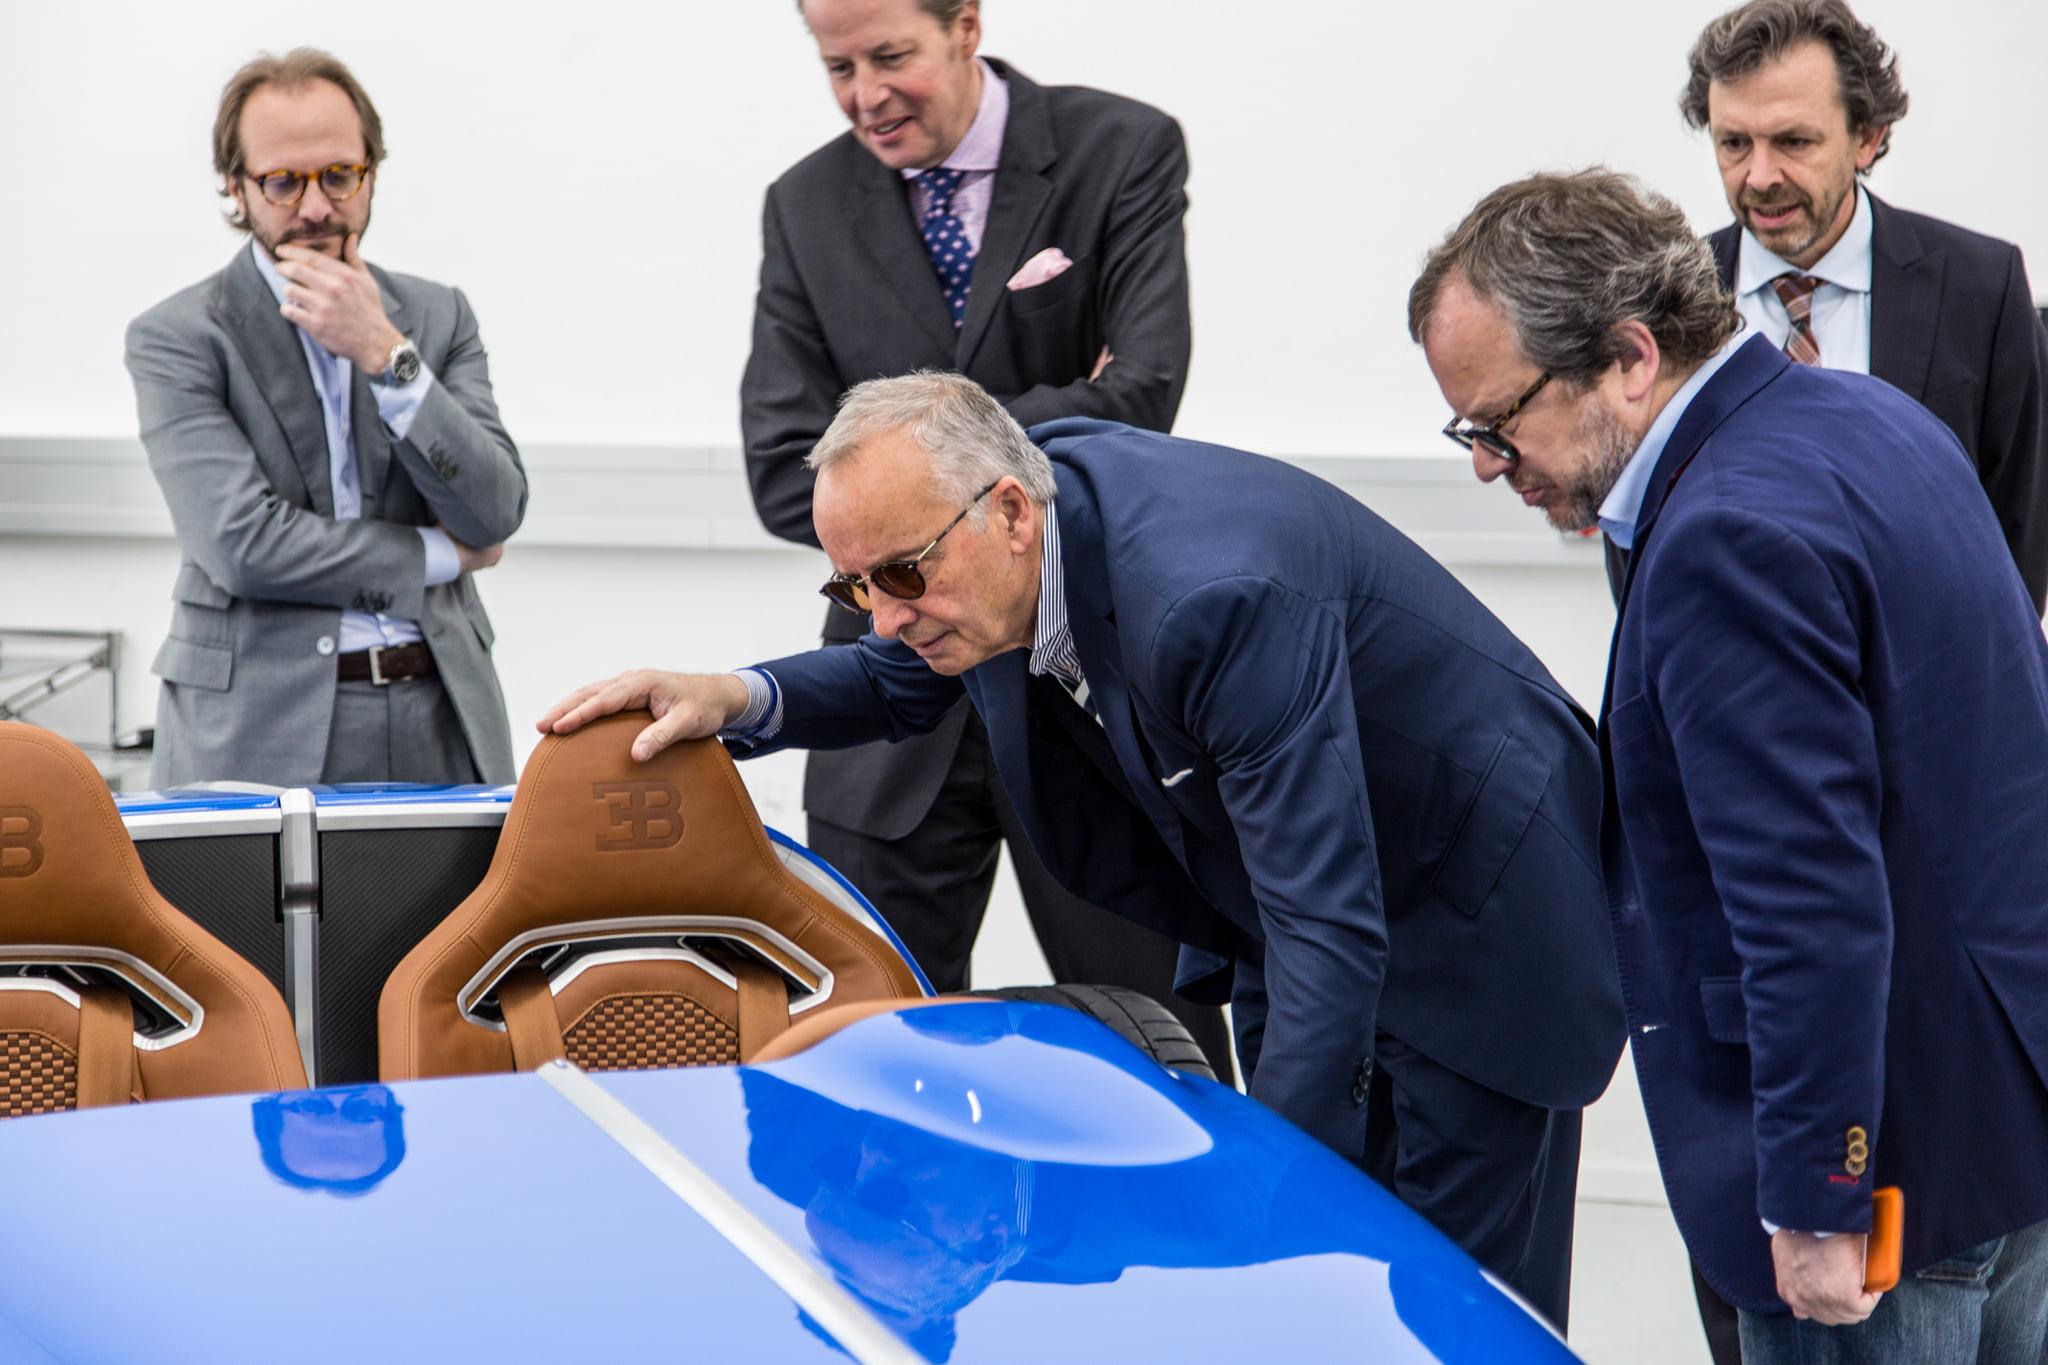 Bugatti-Type-35-D-by-Uedelhoven-Studios-6